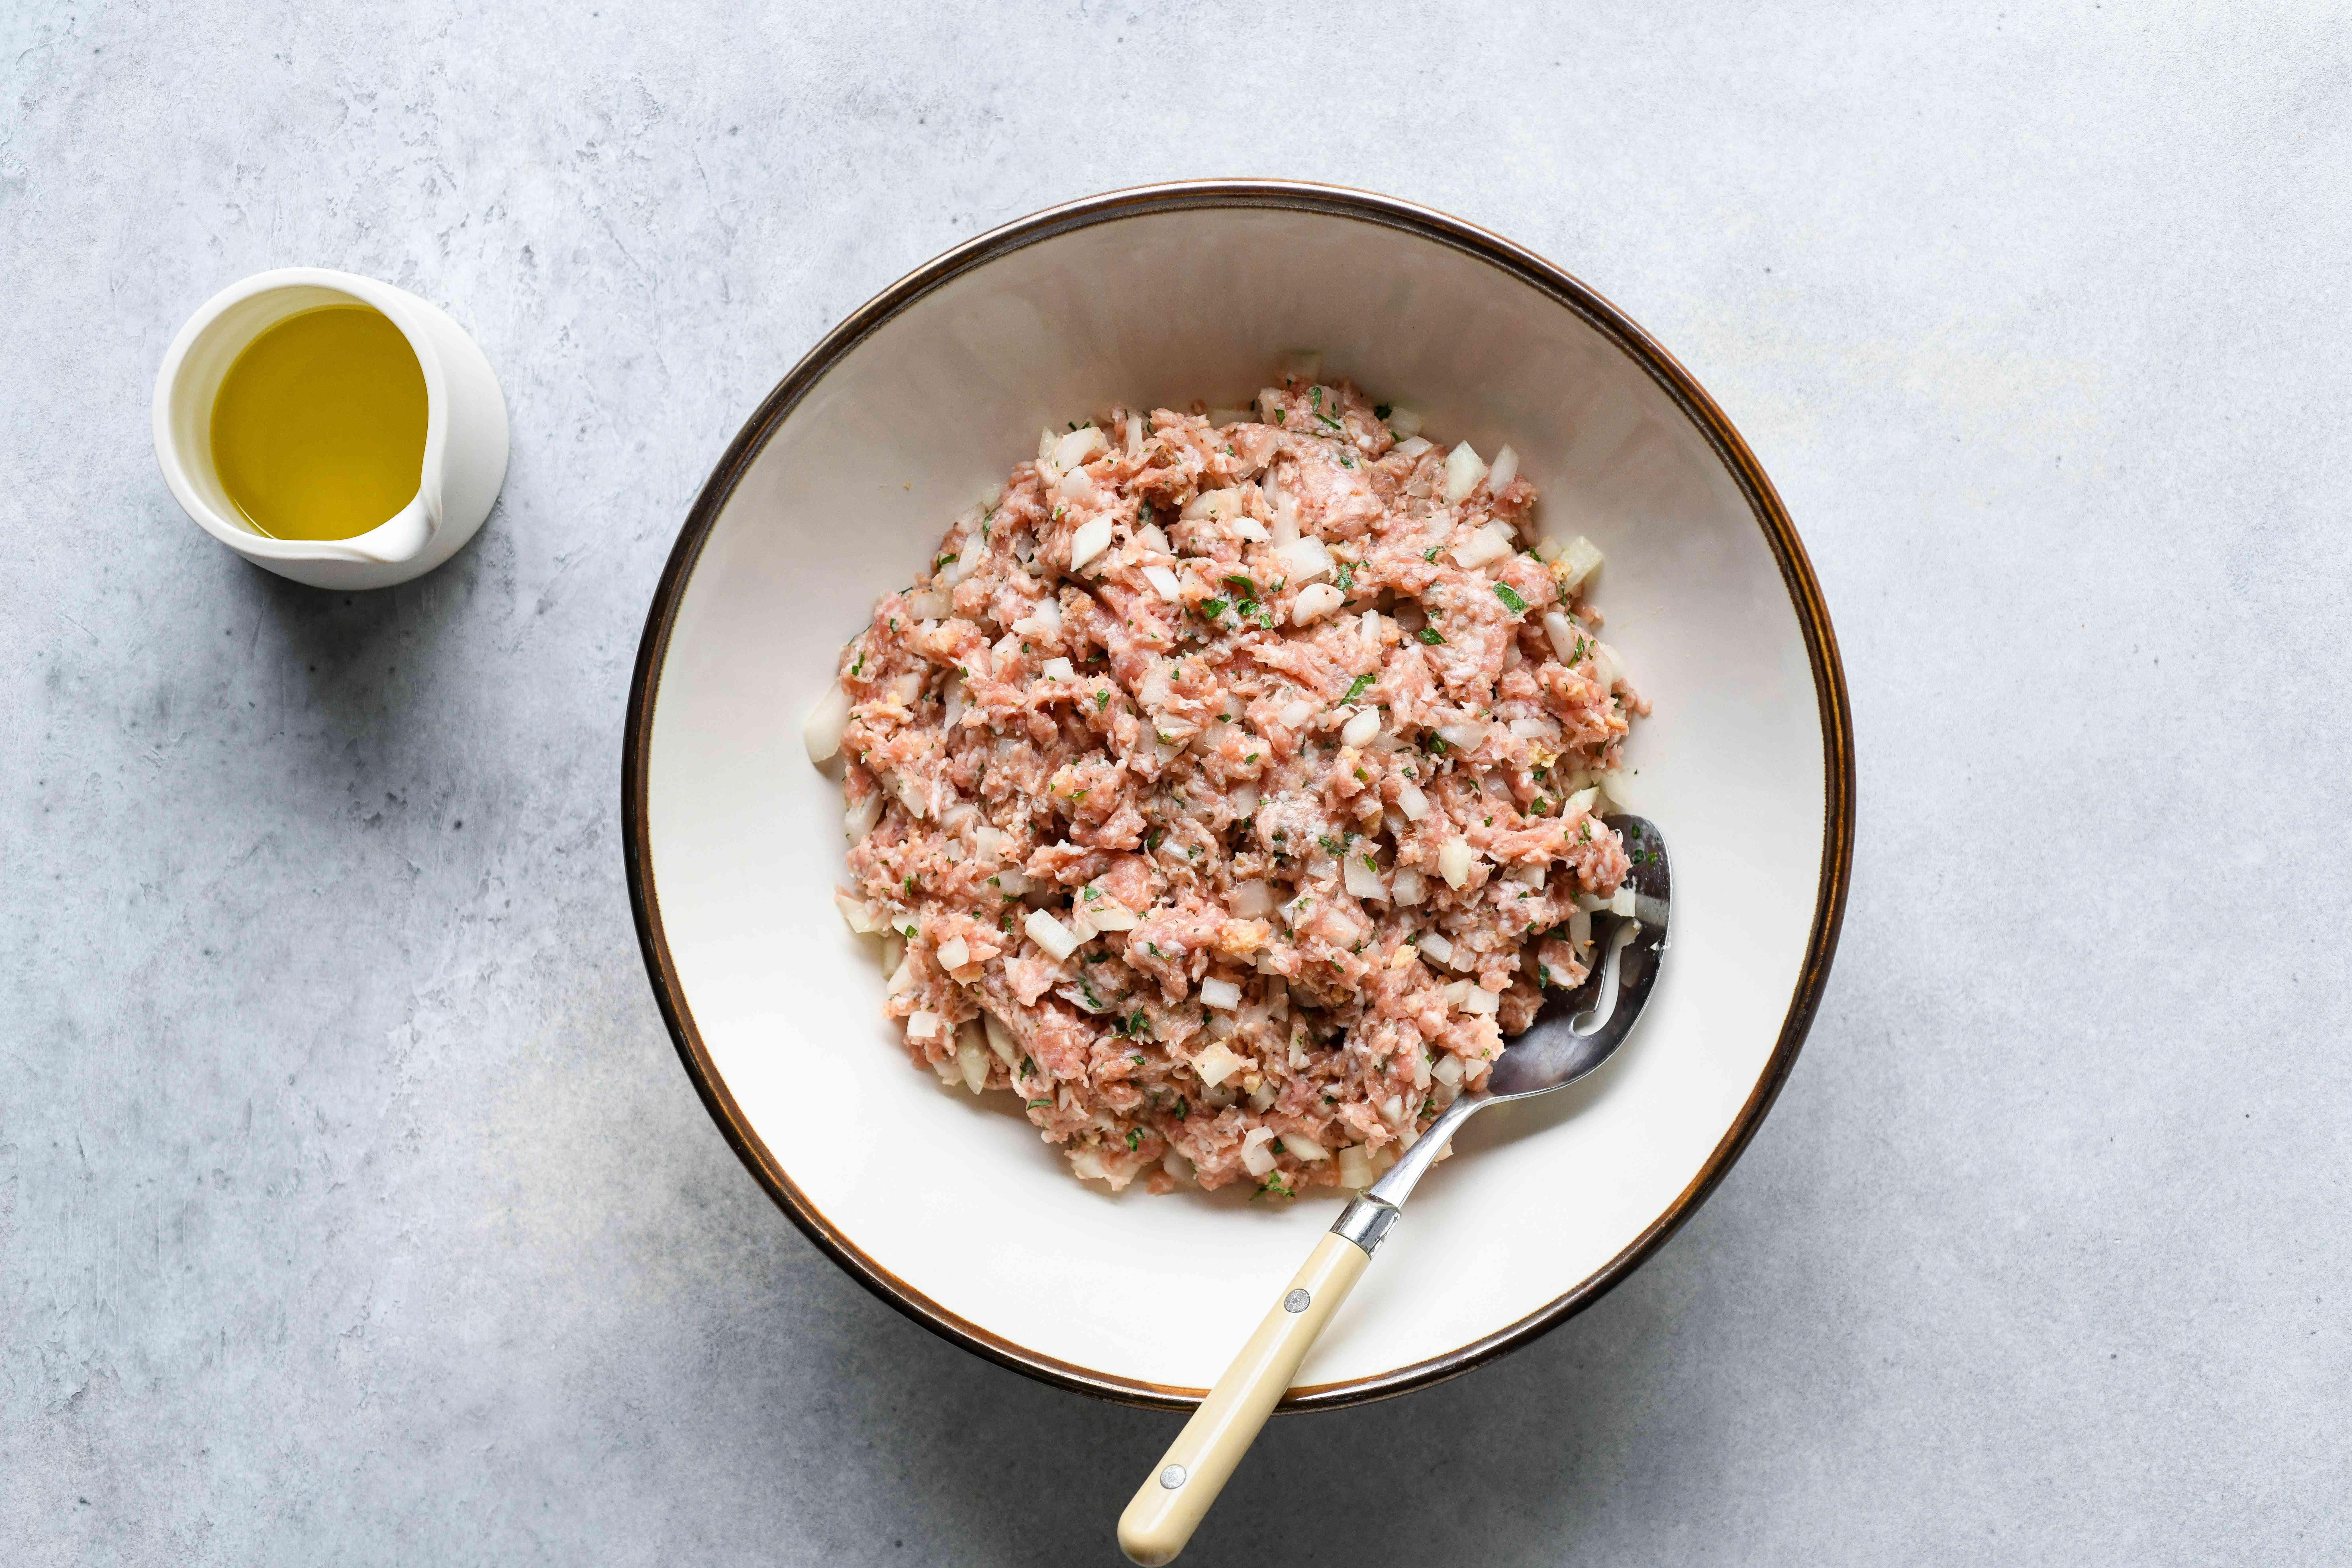 Pork and Onion Meatballs mixture